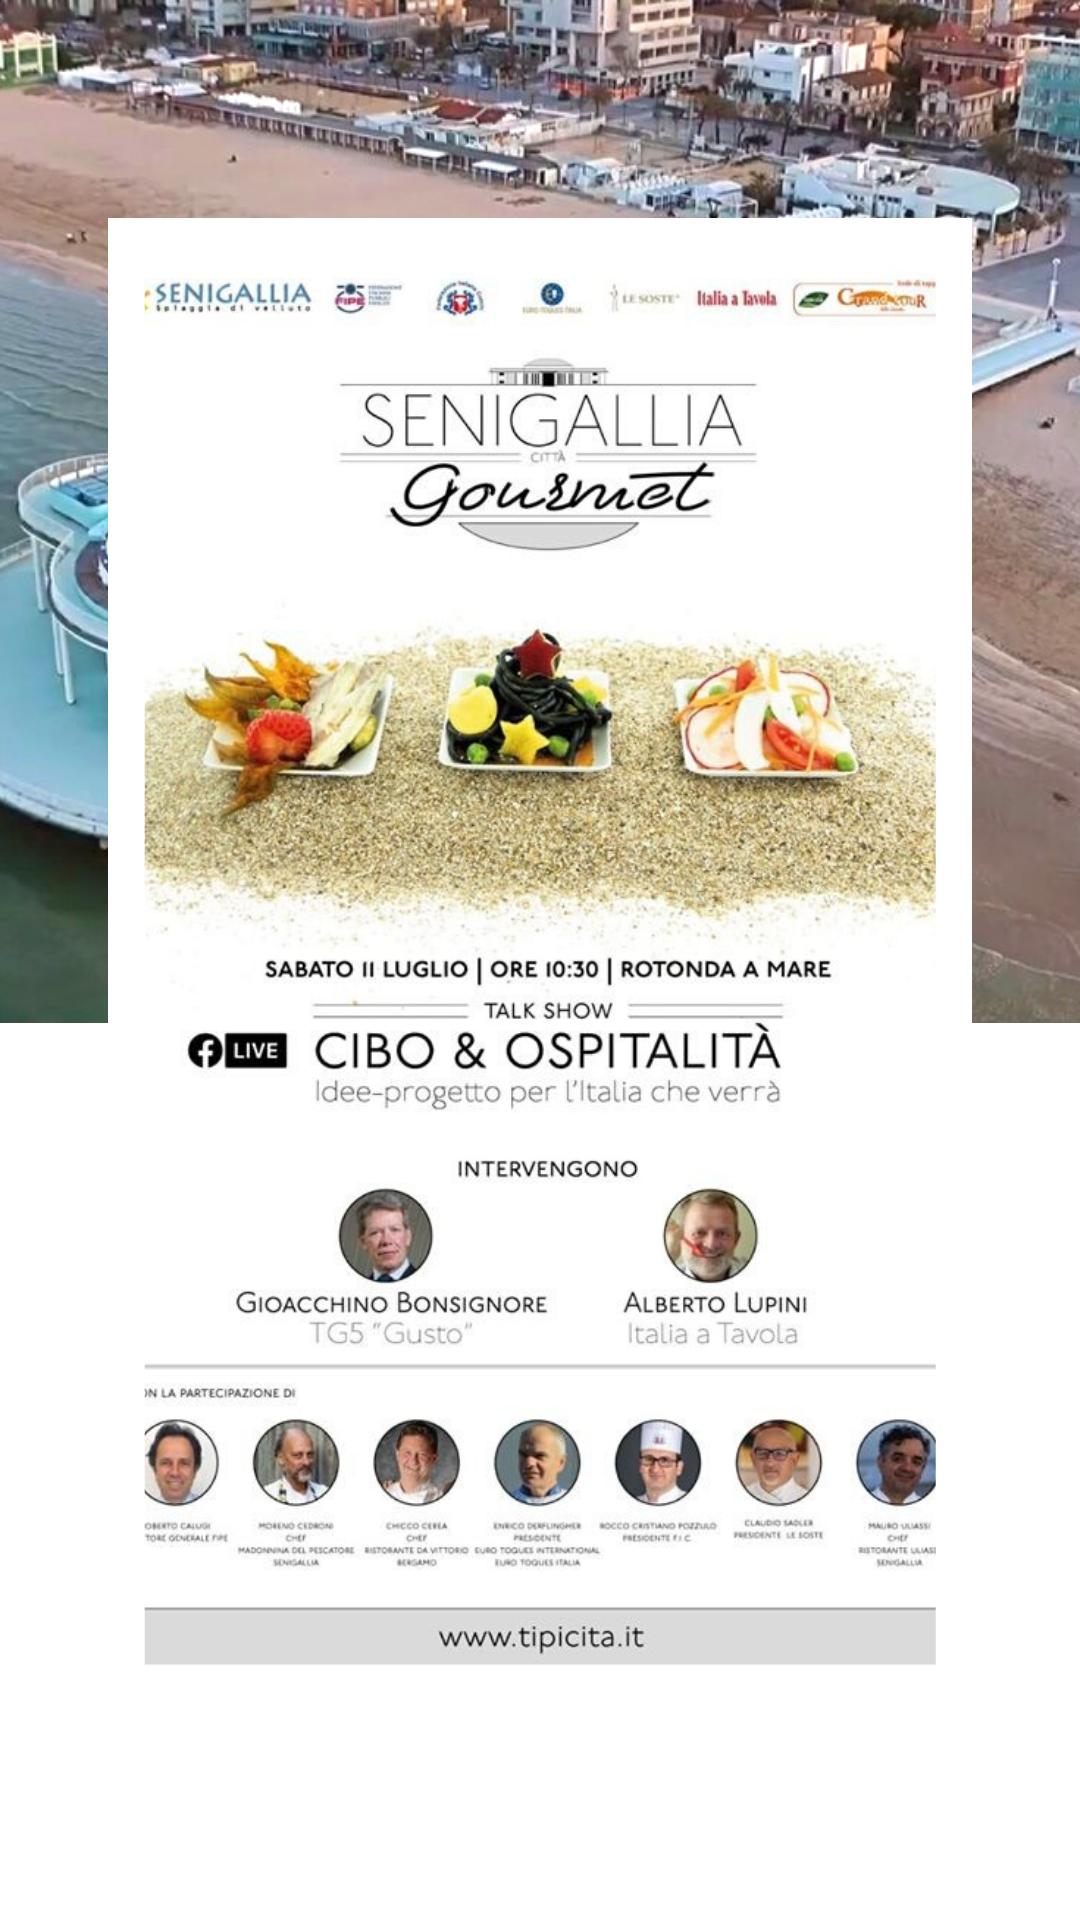 Senigallia Gourmet sulla Rotonda a Mare